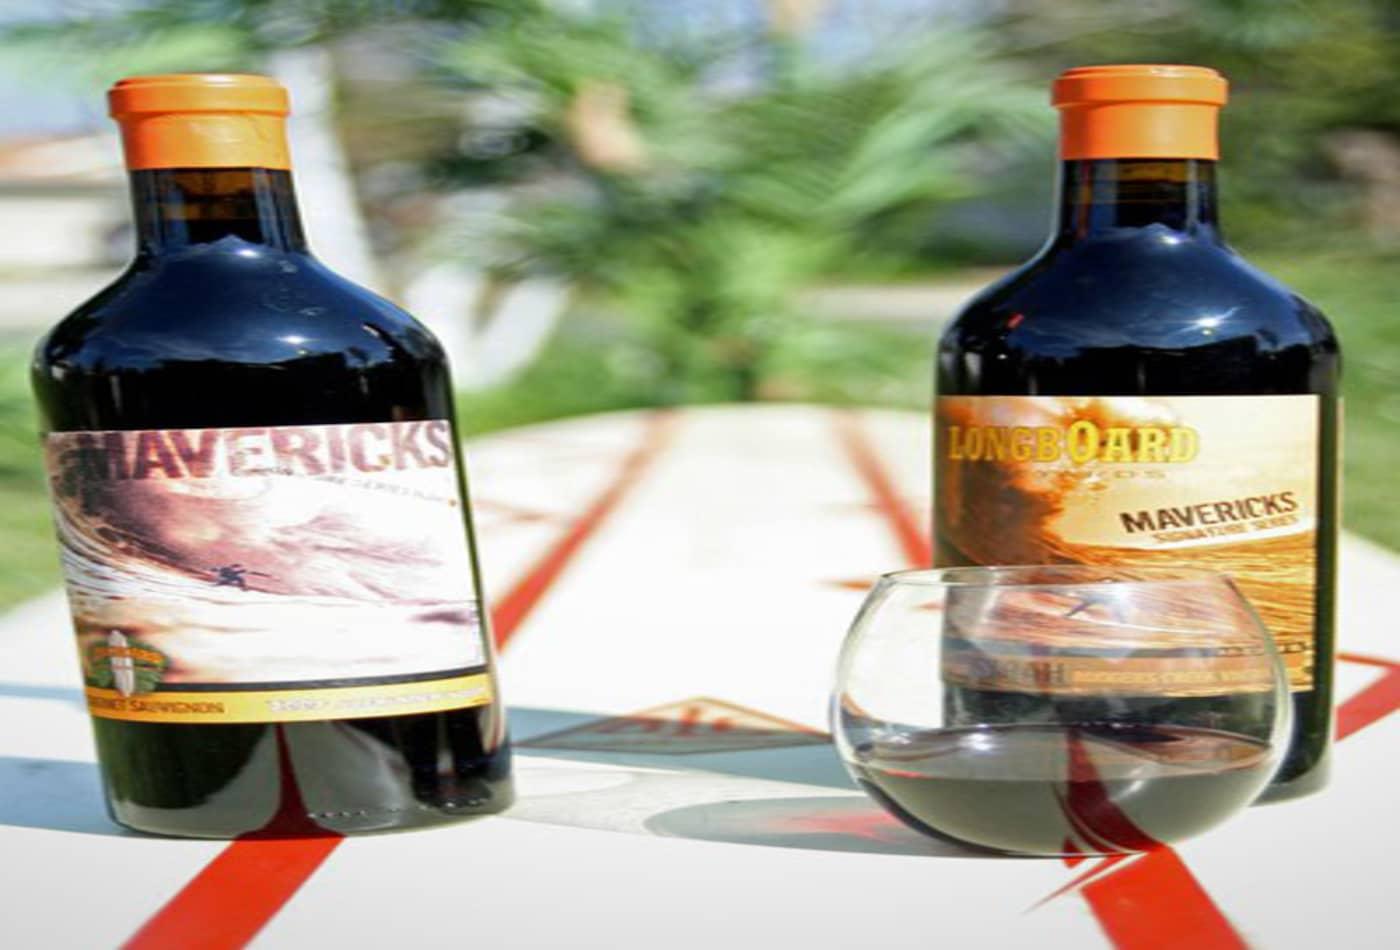 Unique-Wines-maverick.jpg